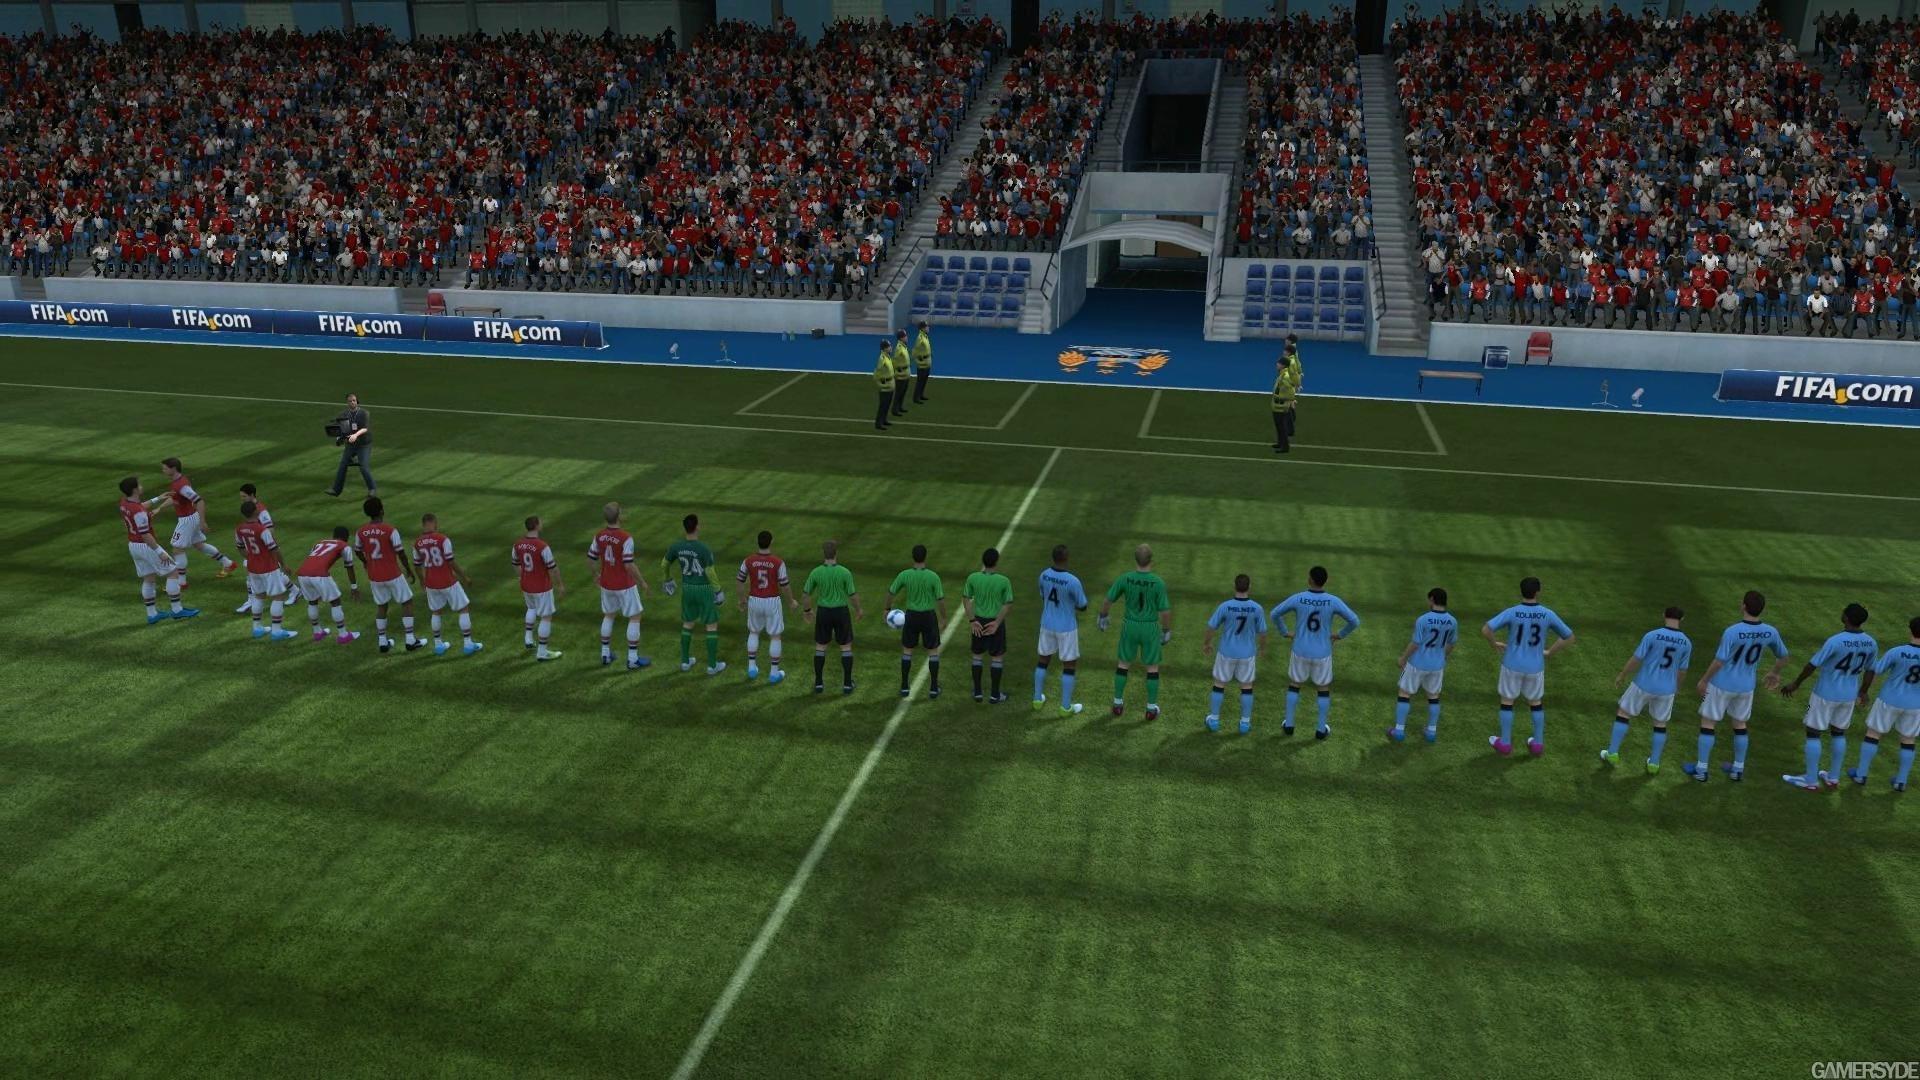 image fifa 13 20261 2509 0007 تصاویر جدید از بازی FIFA 13